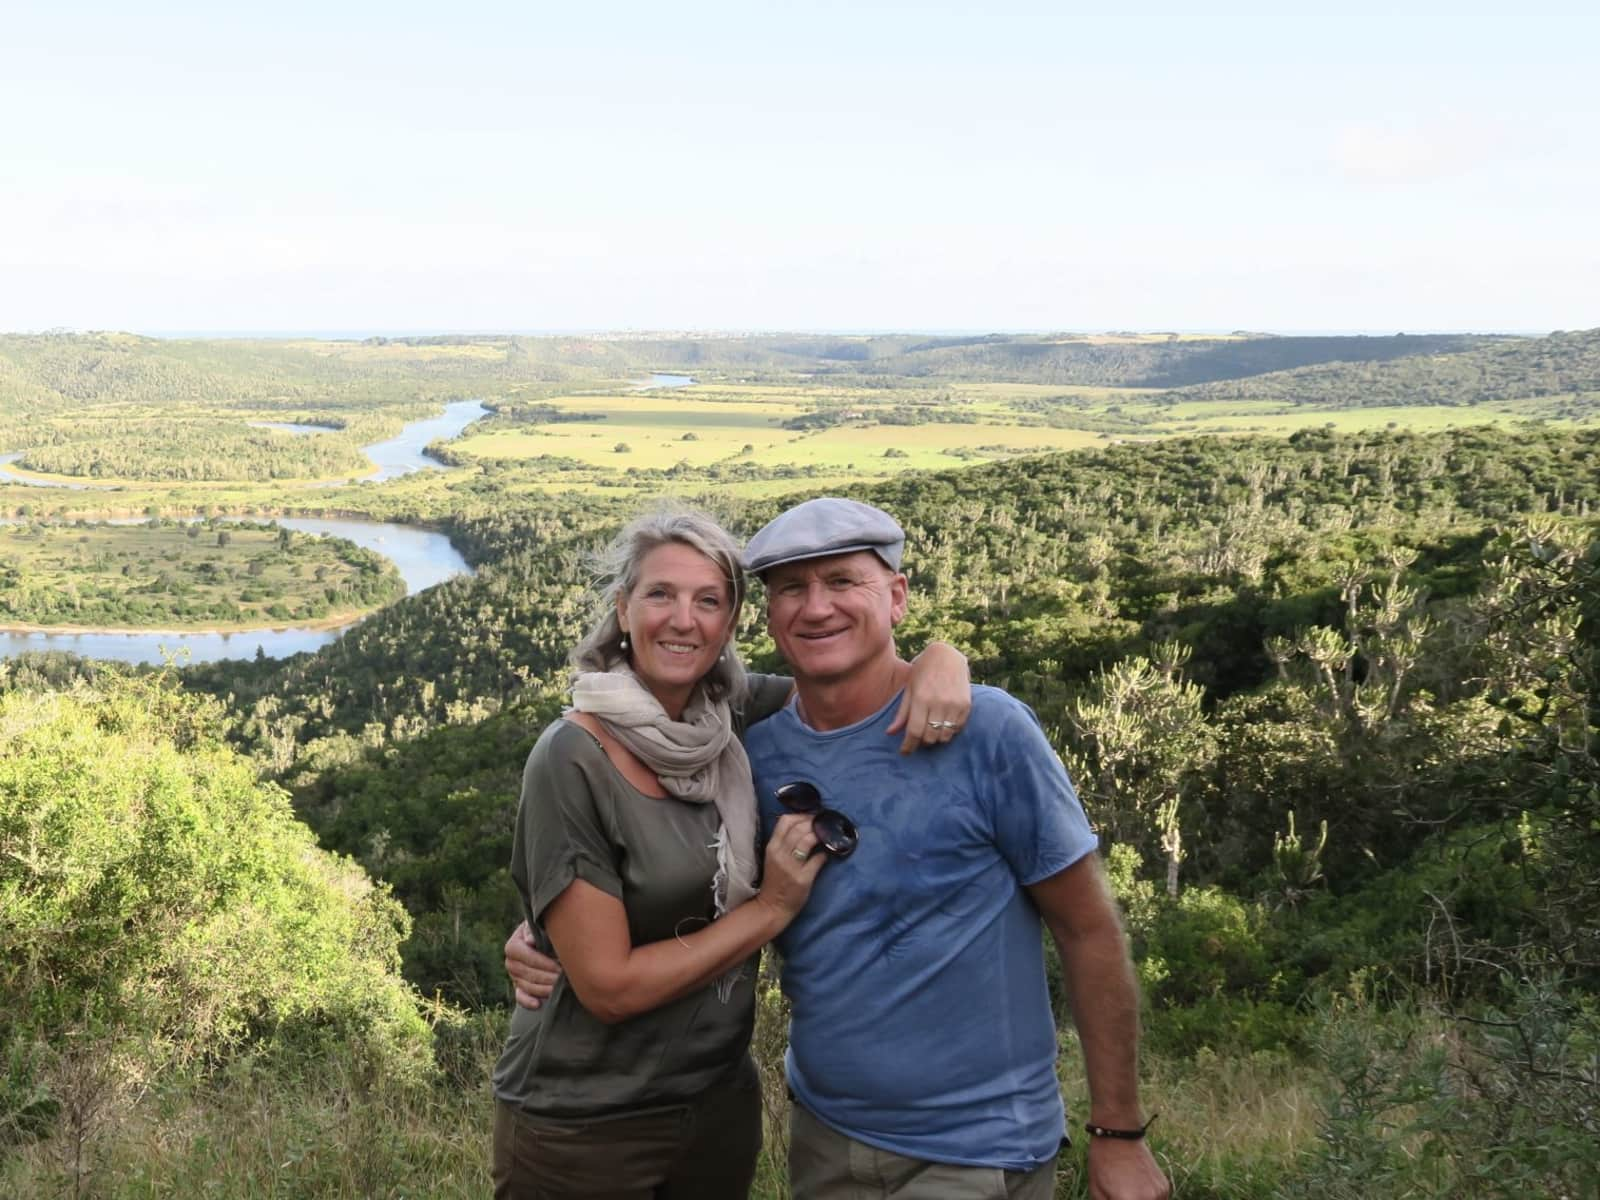 Douglas & Astrid from Haarlem, Netherlands